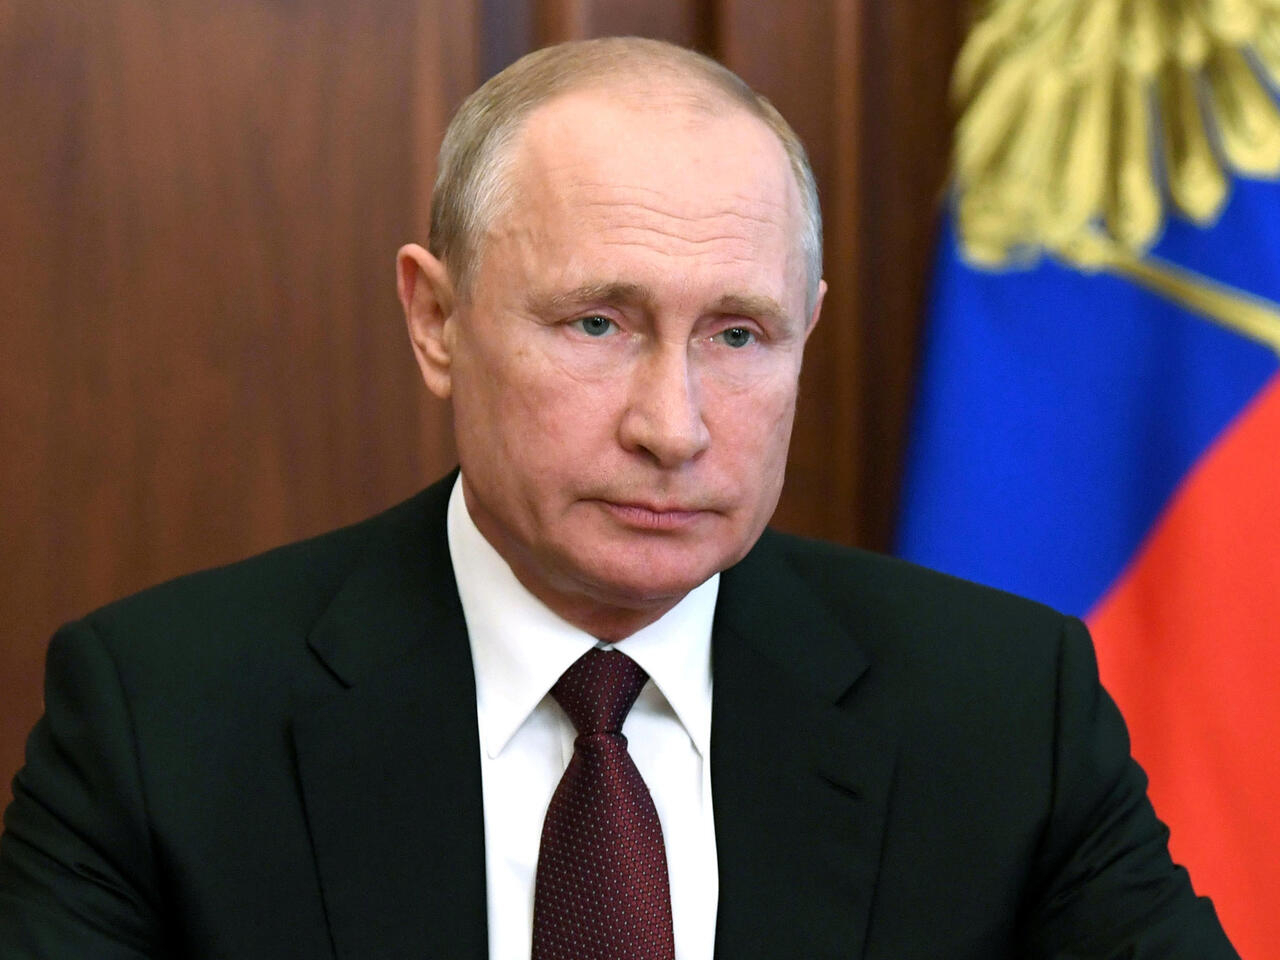 Russia's President Putin announces post-coronavirus tax hike for high earners